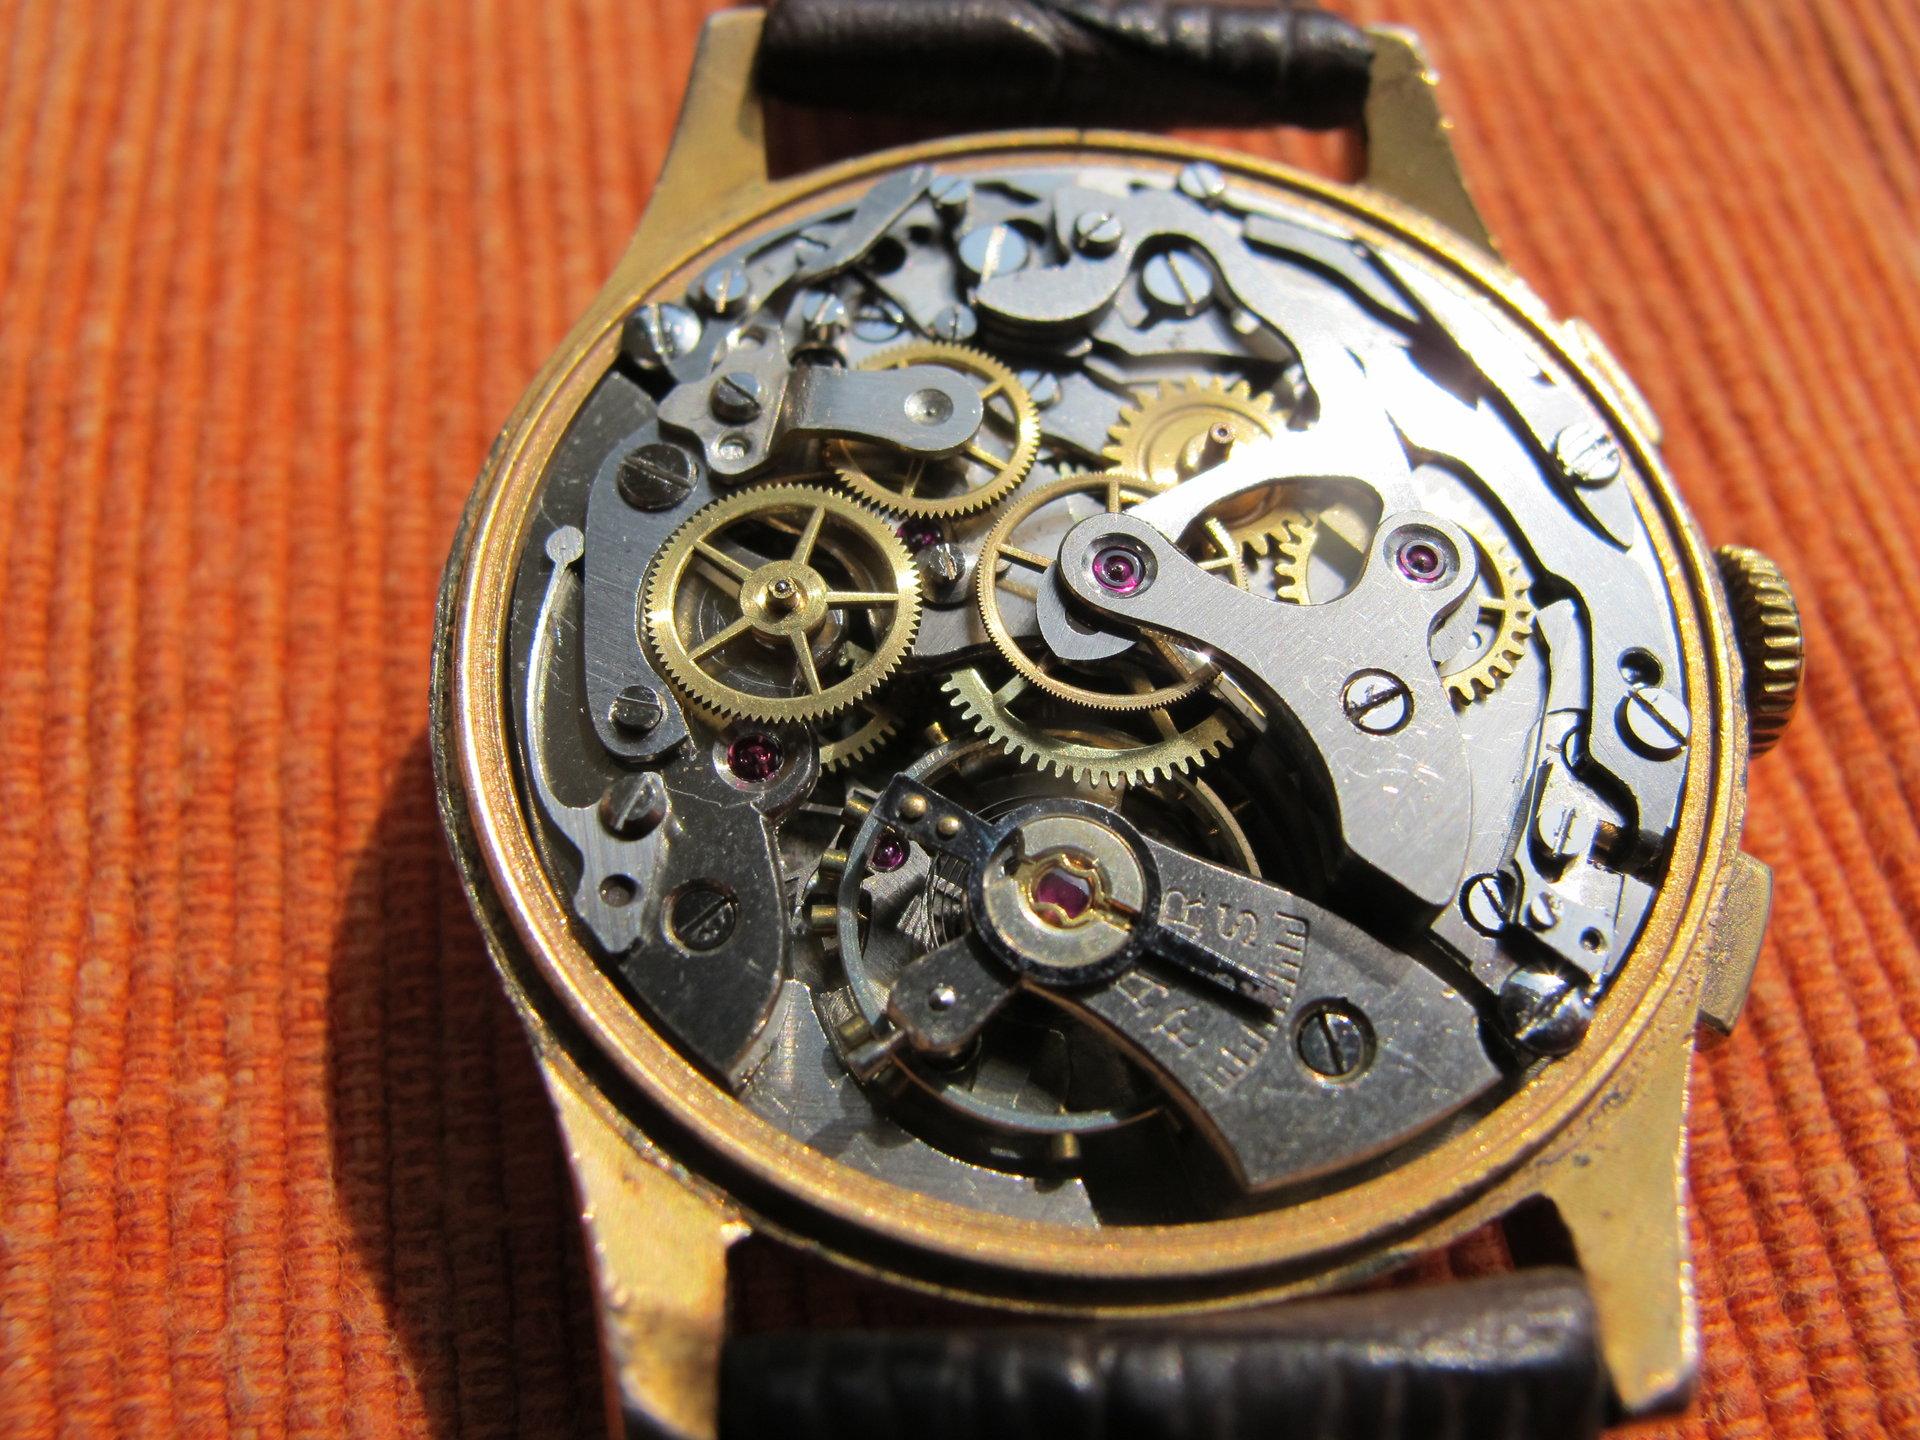 verkauf tausch vintage herren chronograph pontiac landeron 248 kaliber handaufzug uhrforum. Black Bedroom Furniture Sets. Home Design Ideas